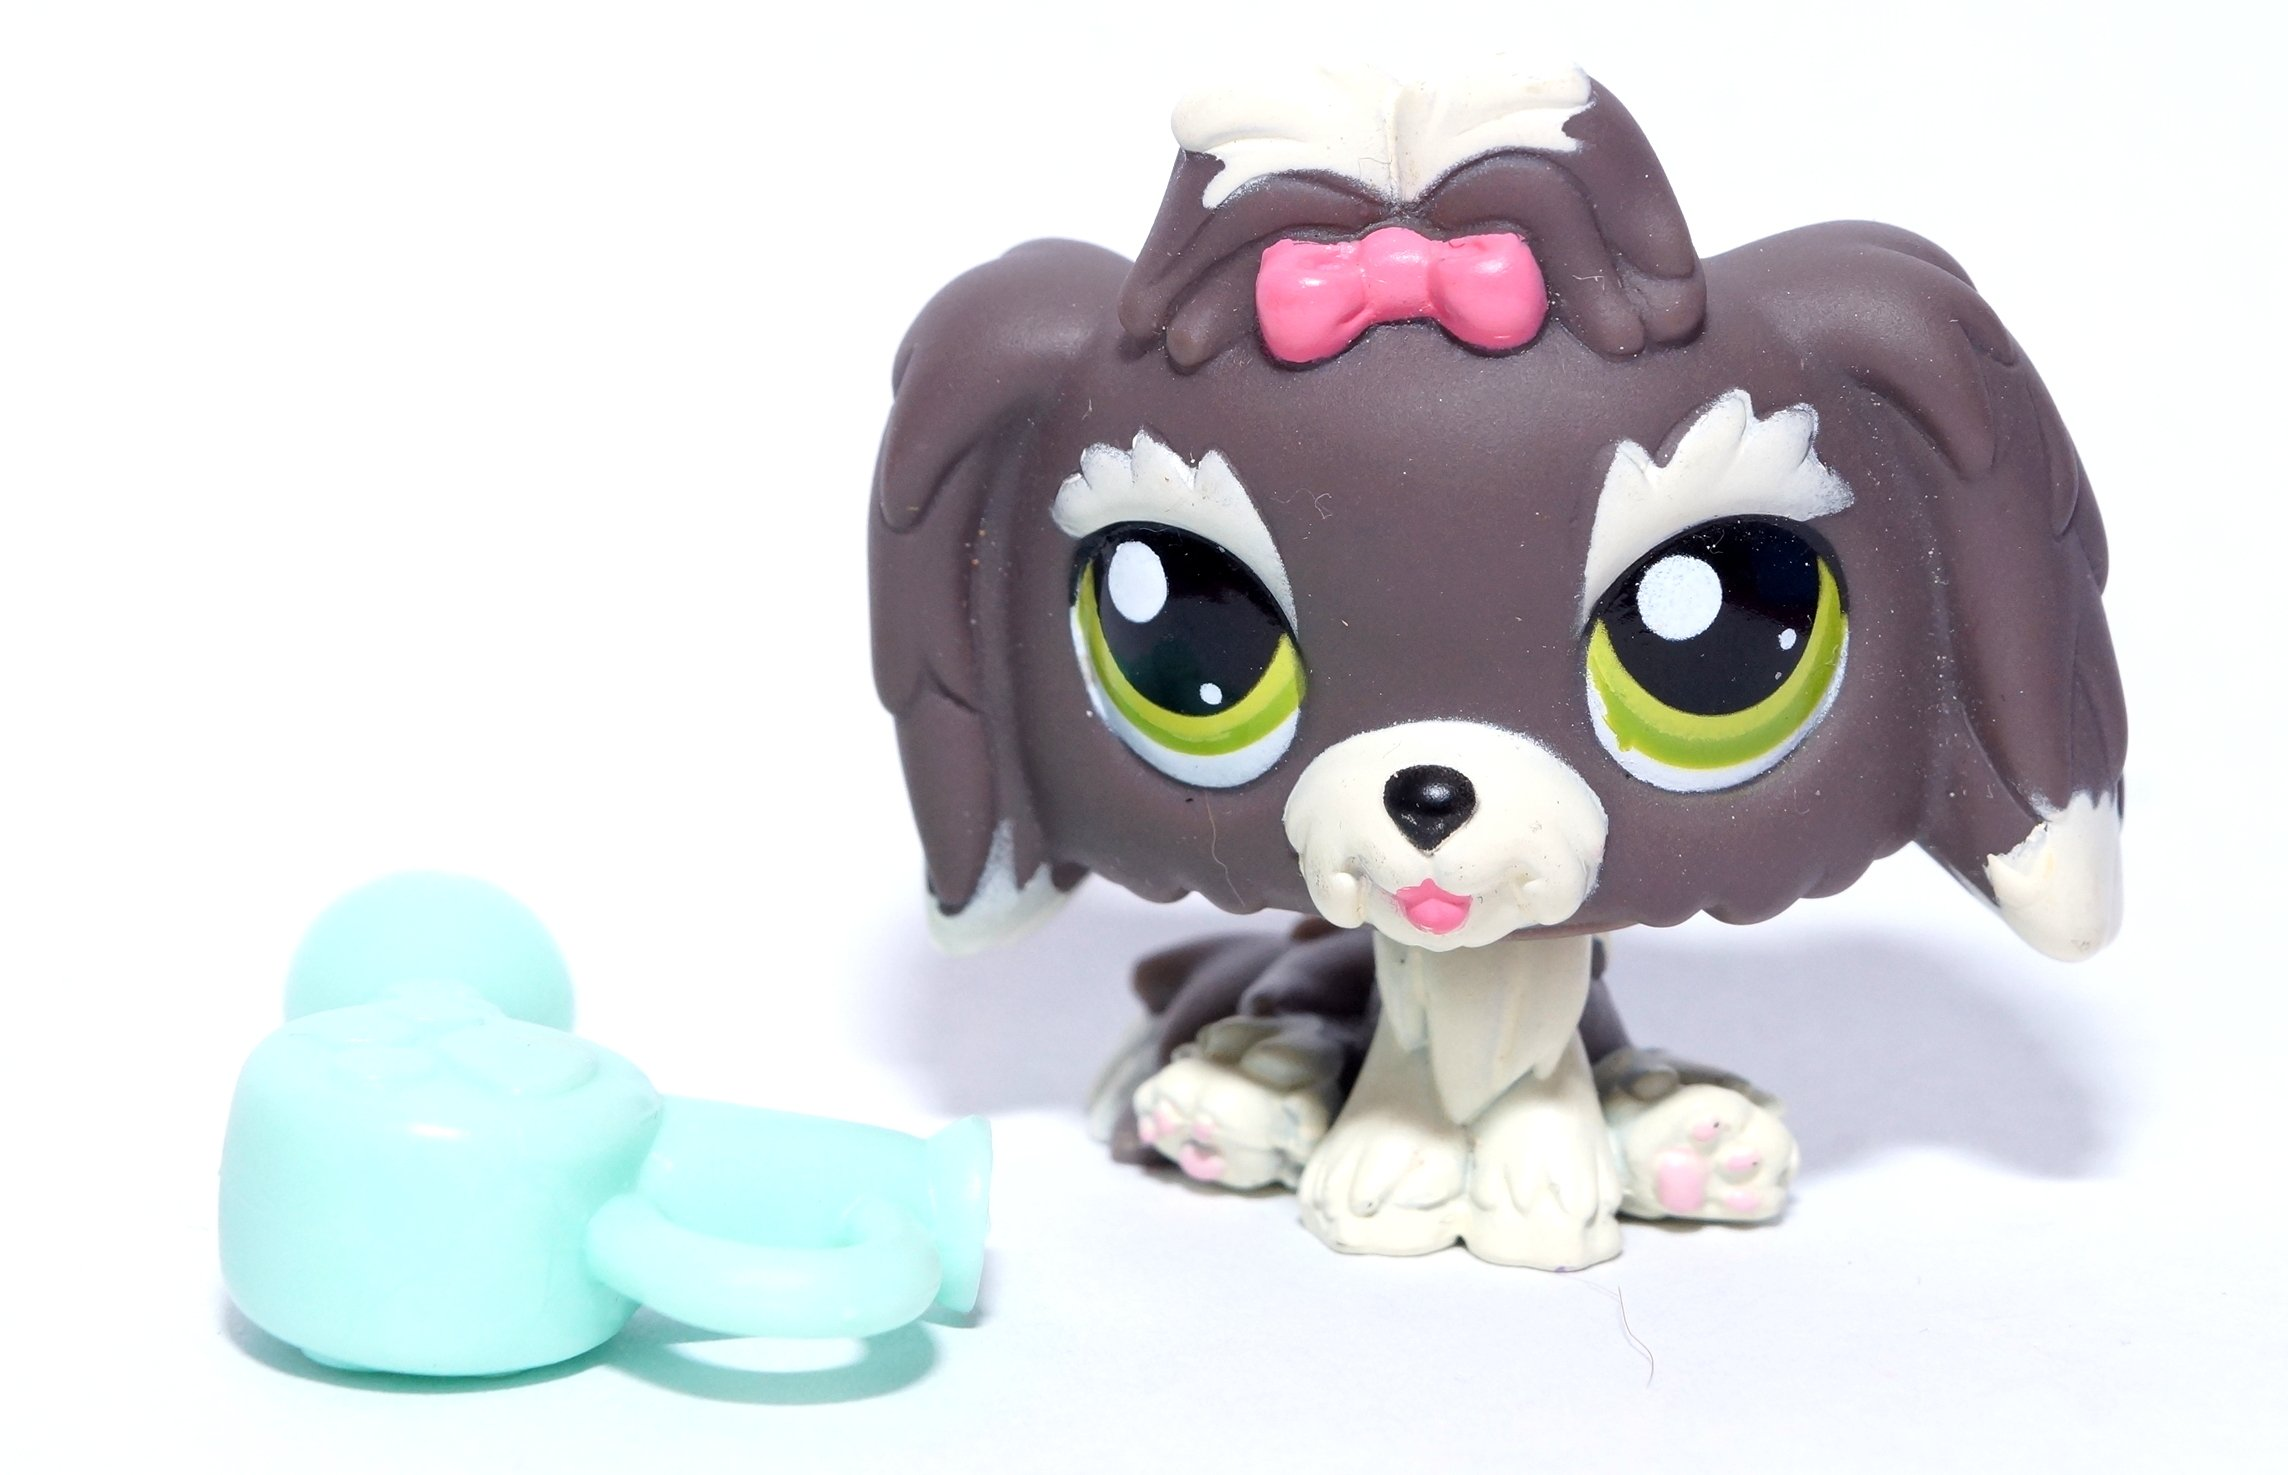 Lps Littlest Pet Shop Figurka Shih Tzu Piesek 7118629863